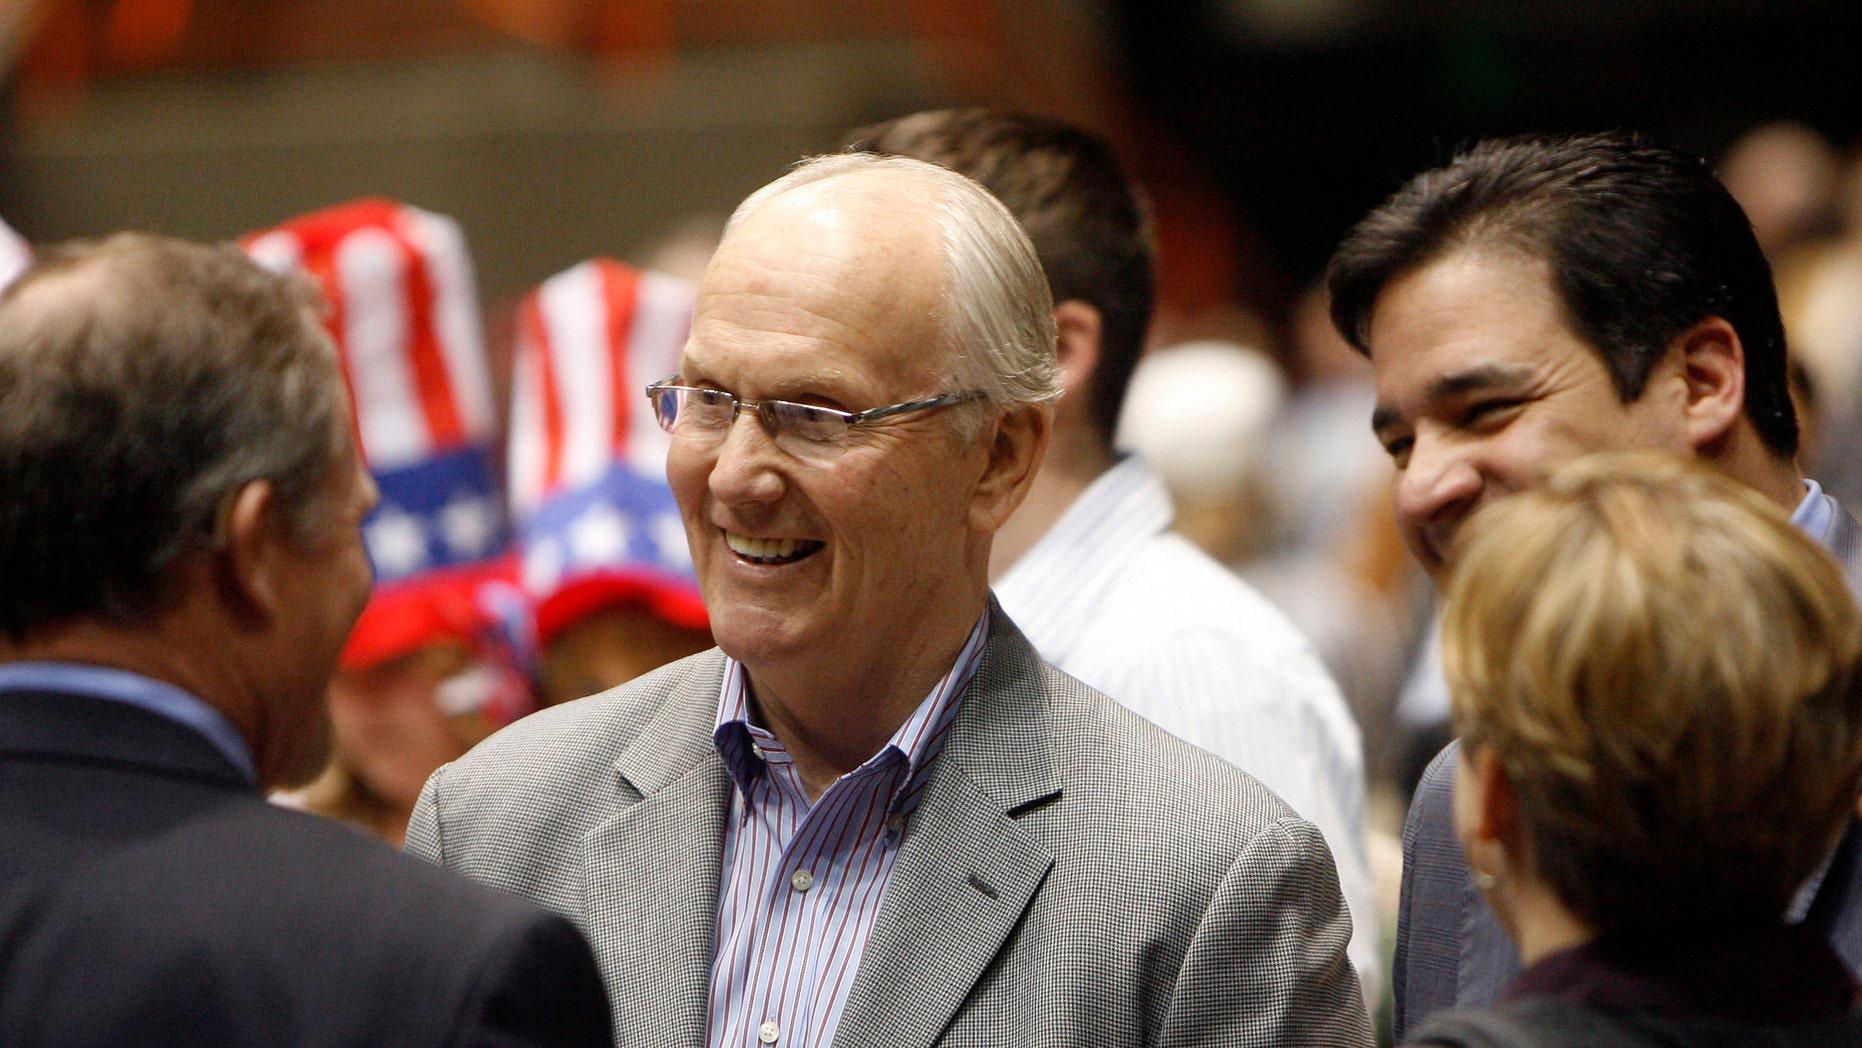 March 6, 2012: Former Idaho Sen. Larry Craig attends the Ada County Republicans caucus.